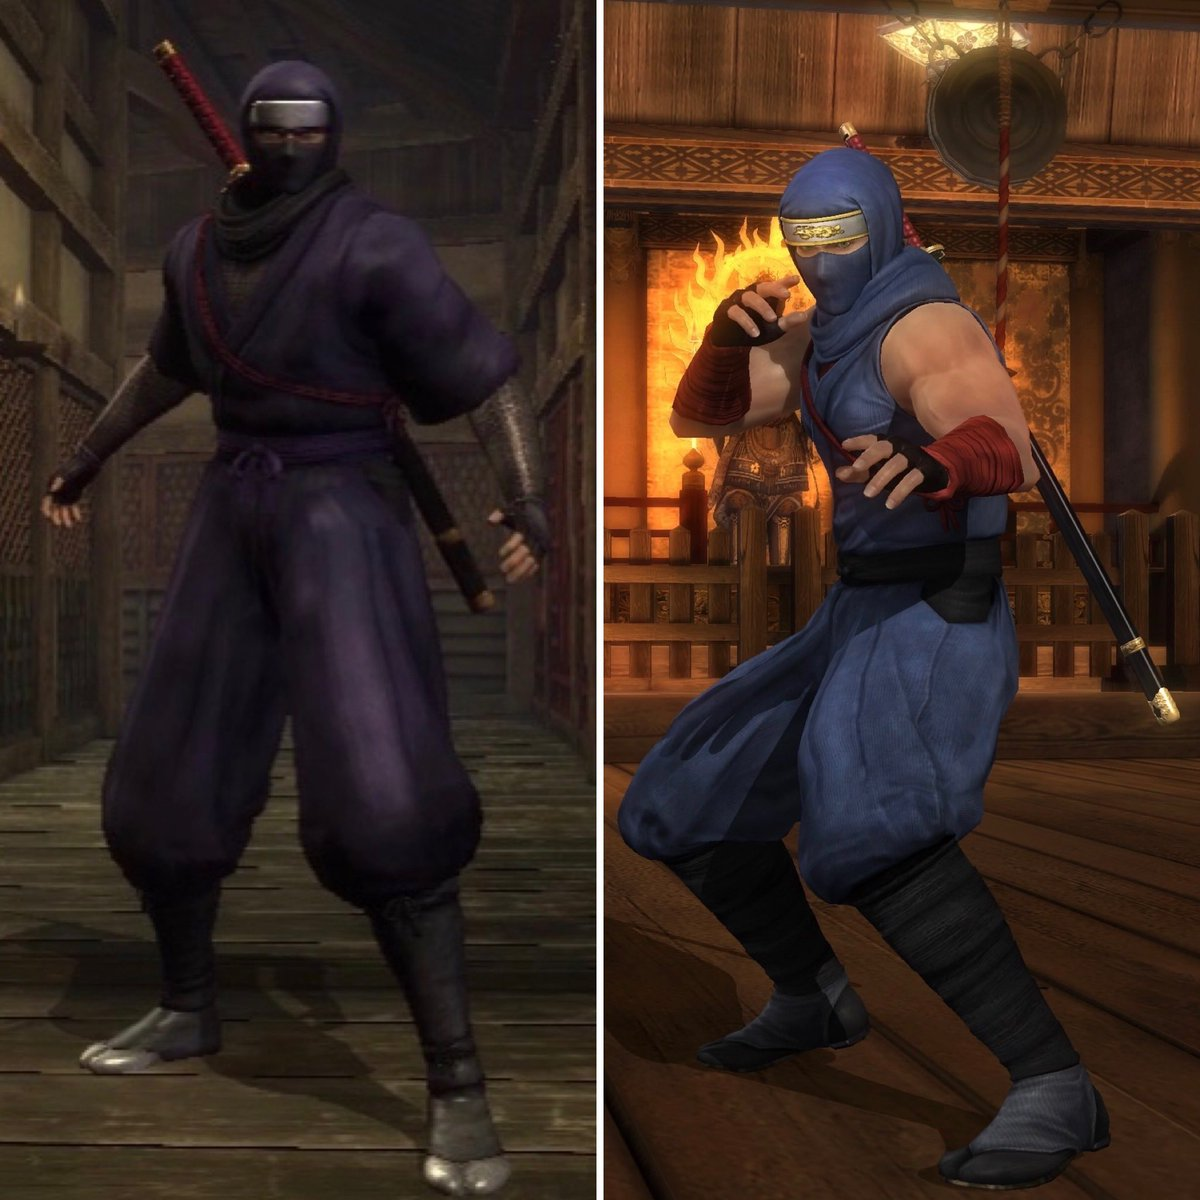 Lorenzo Buti On Twitter Don T You Wish To See Ryu Hayabusa